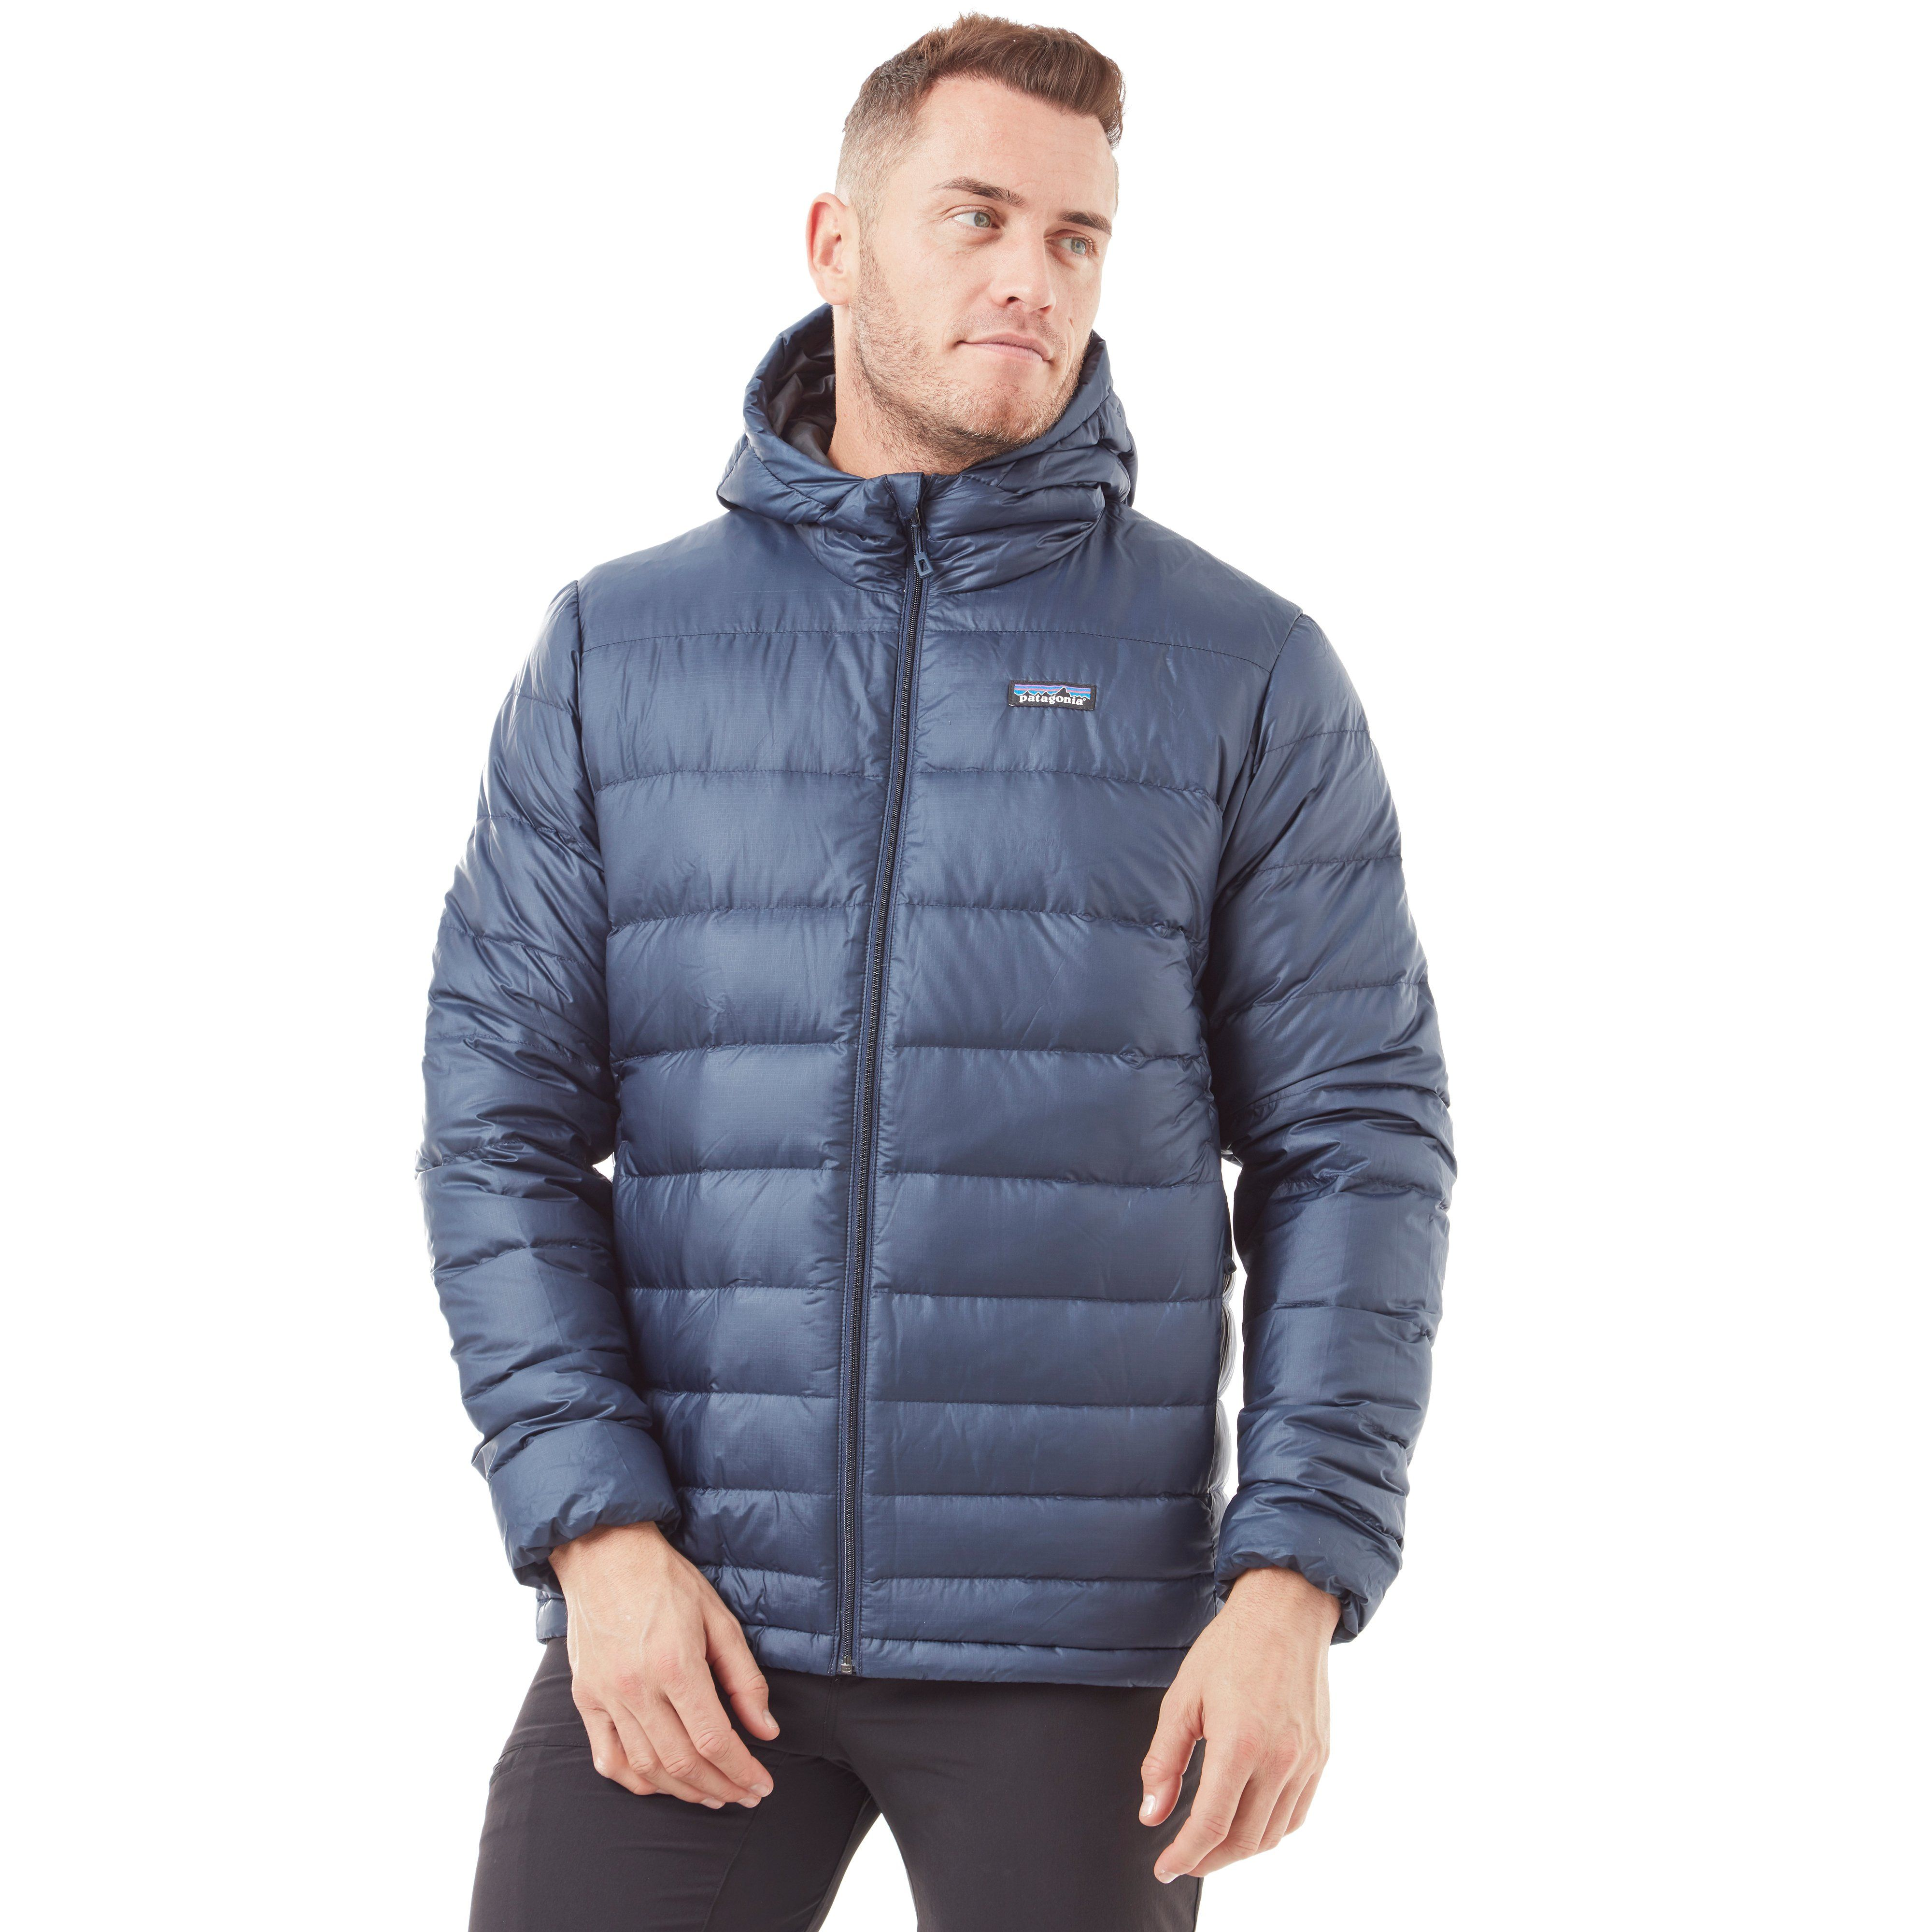 Patagonia Hi-Loft Down Men's Hooded Jacket